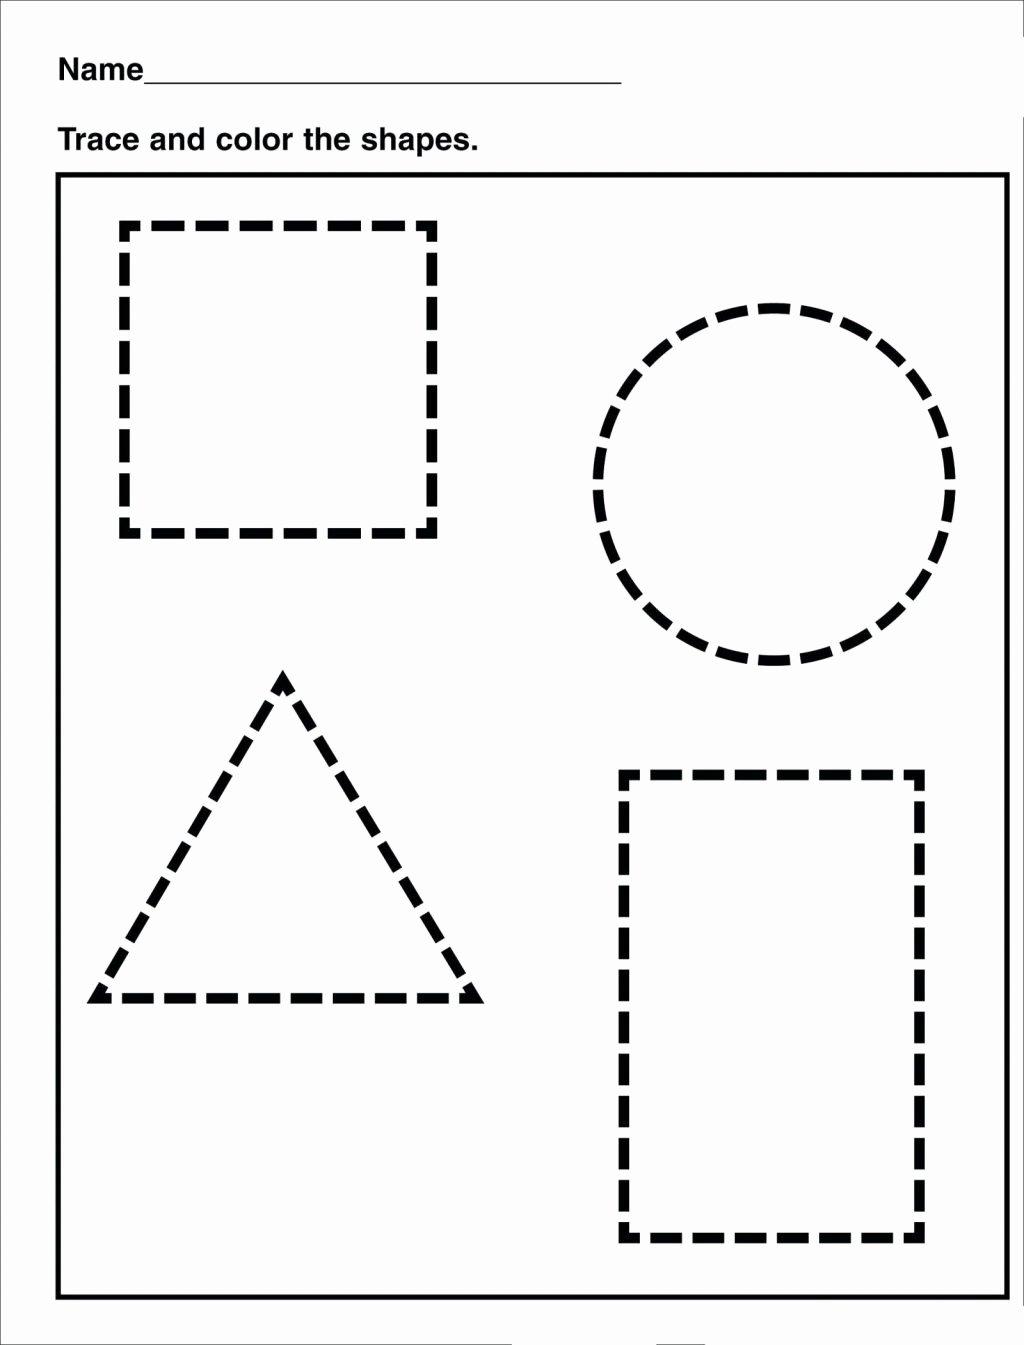 Traceable Shapes Worksheets For Preschoolers